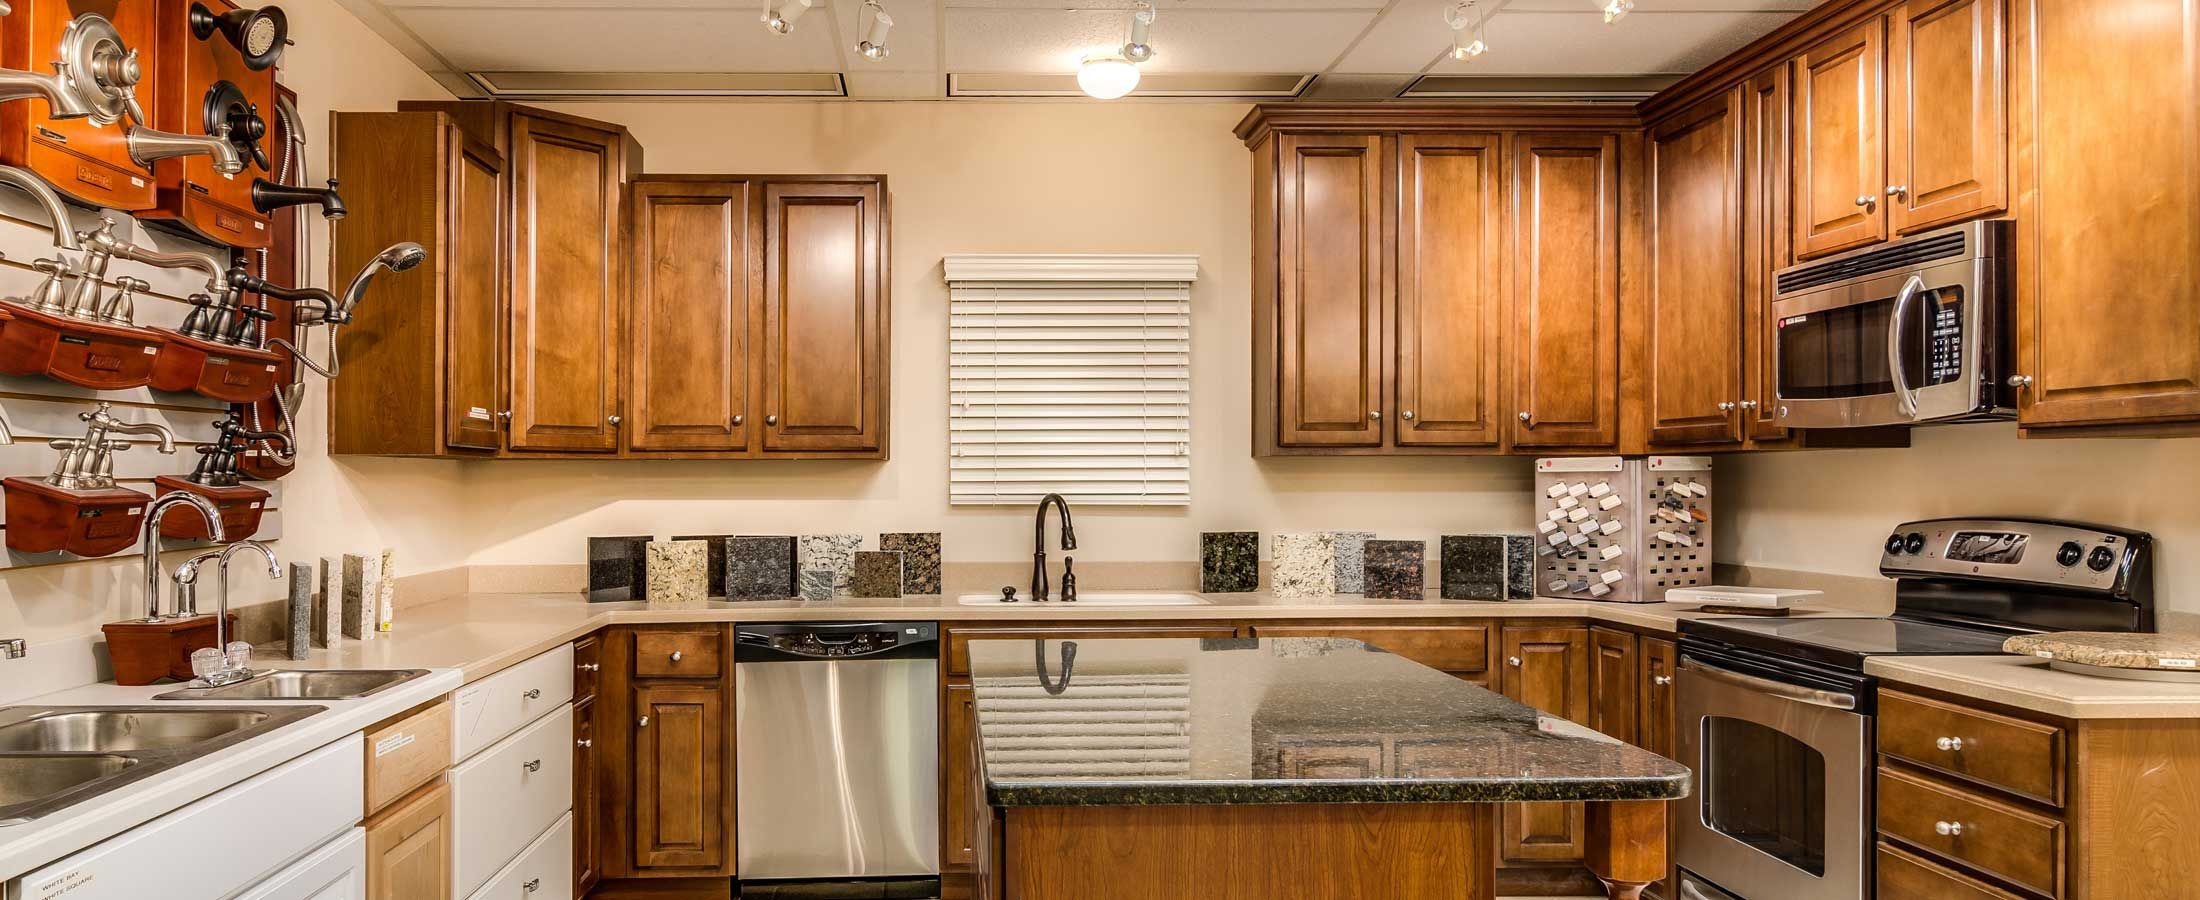 Columbus Home Design Center - Design your Dream Home with Trinity ...